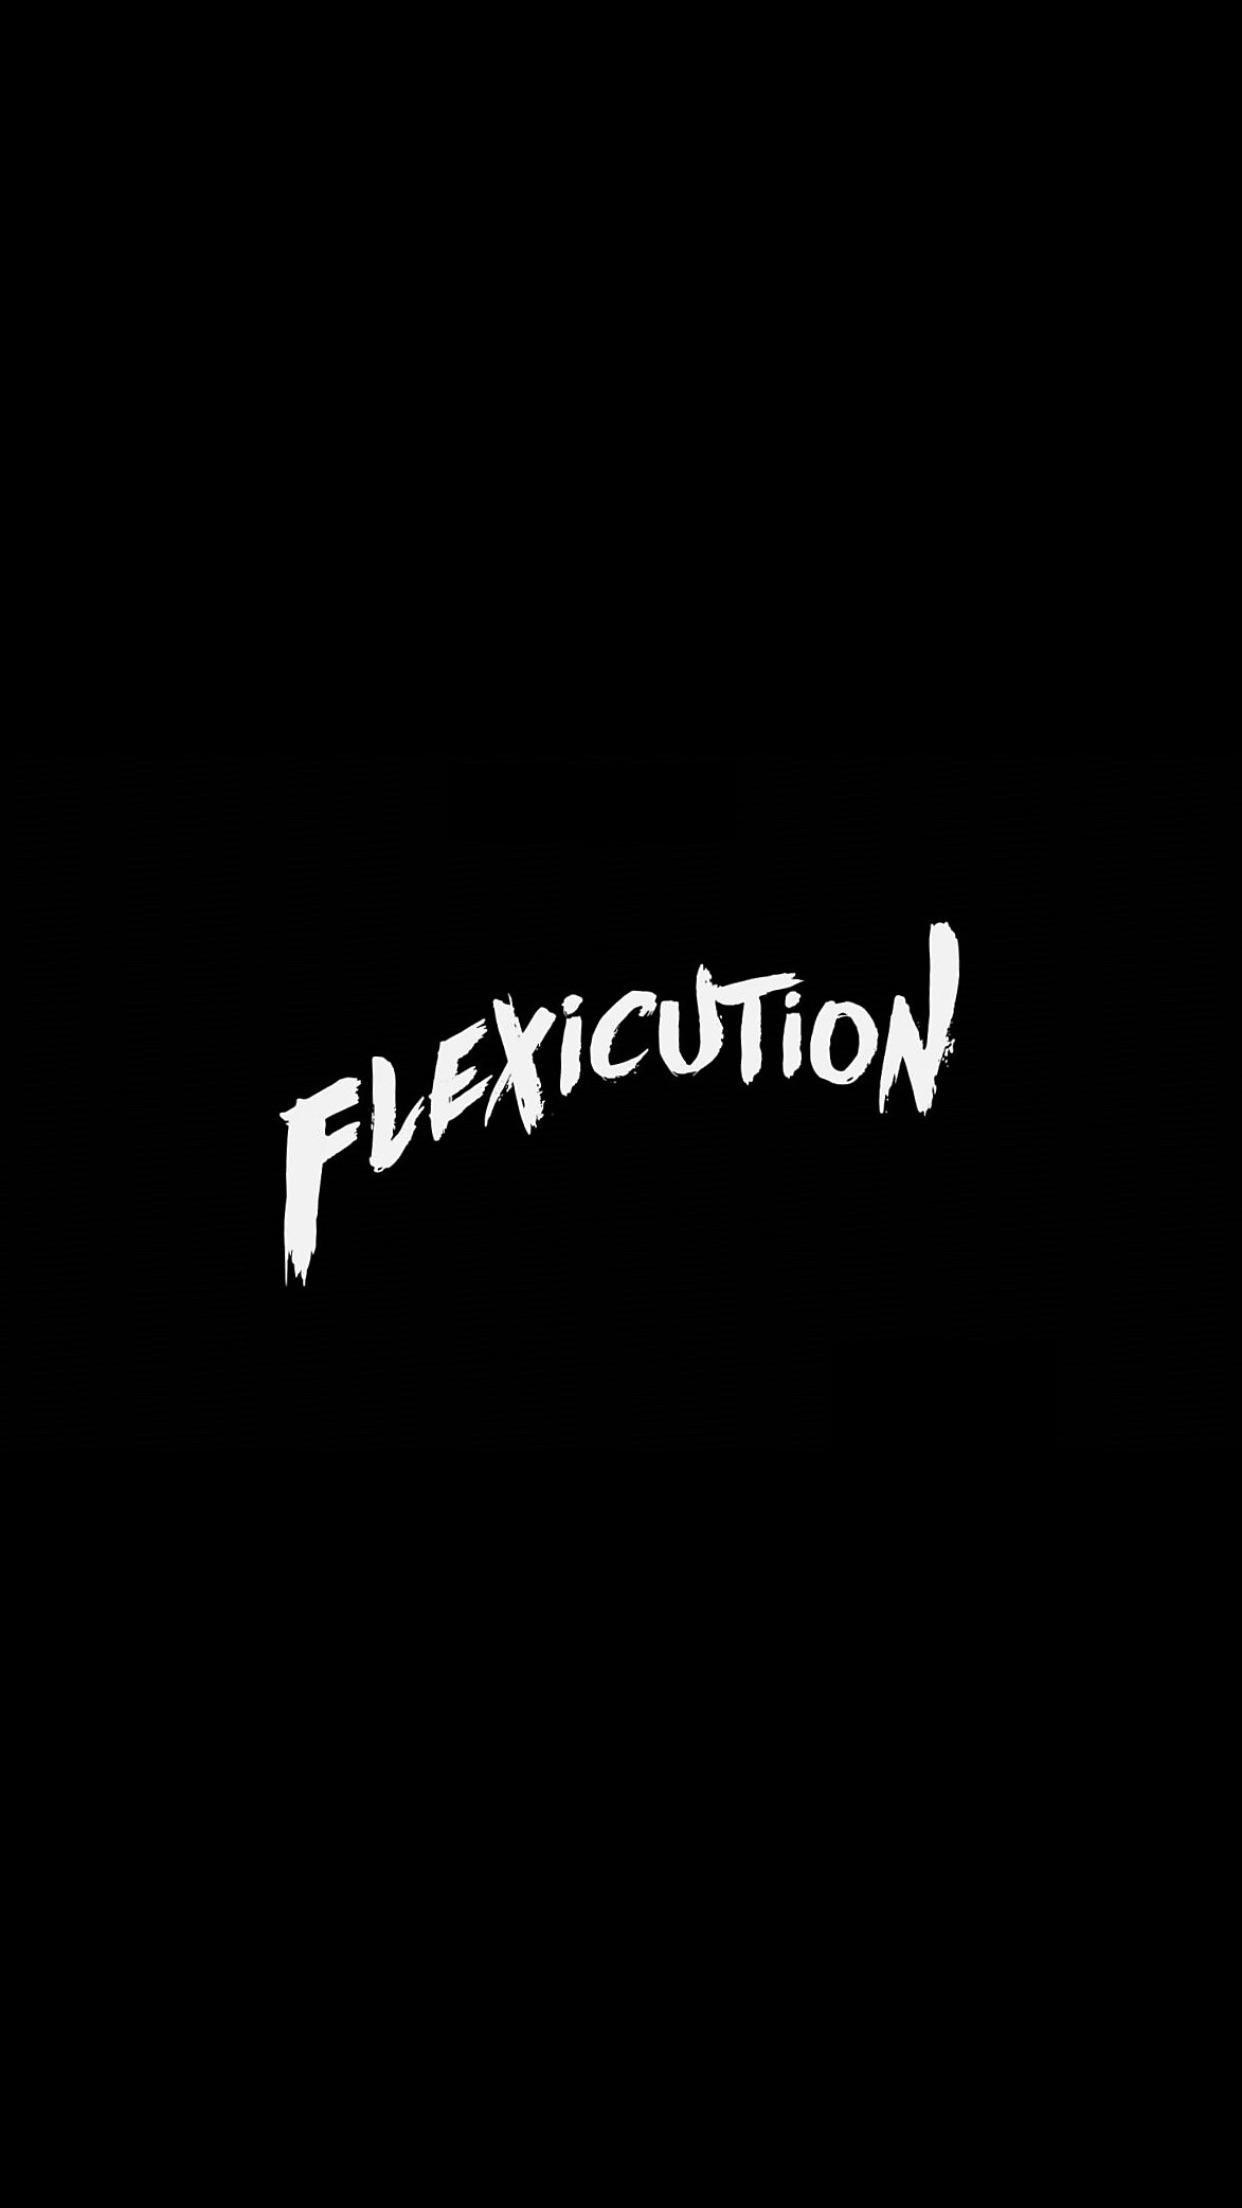 Wallpaper for Flexicution …